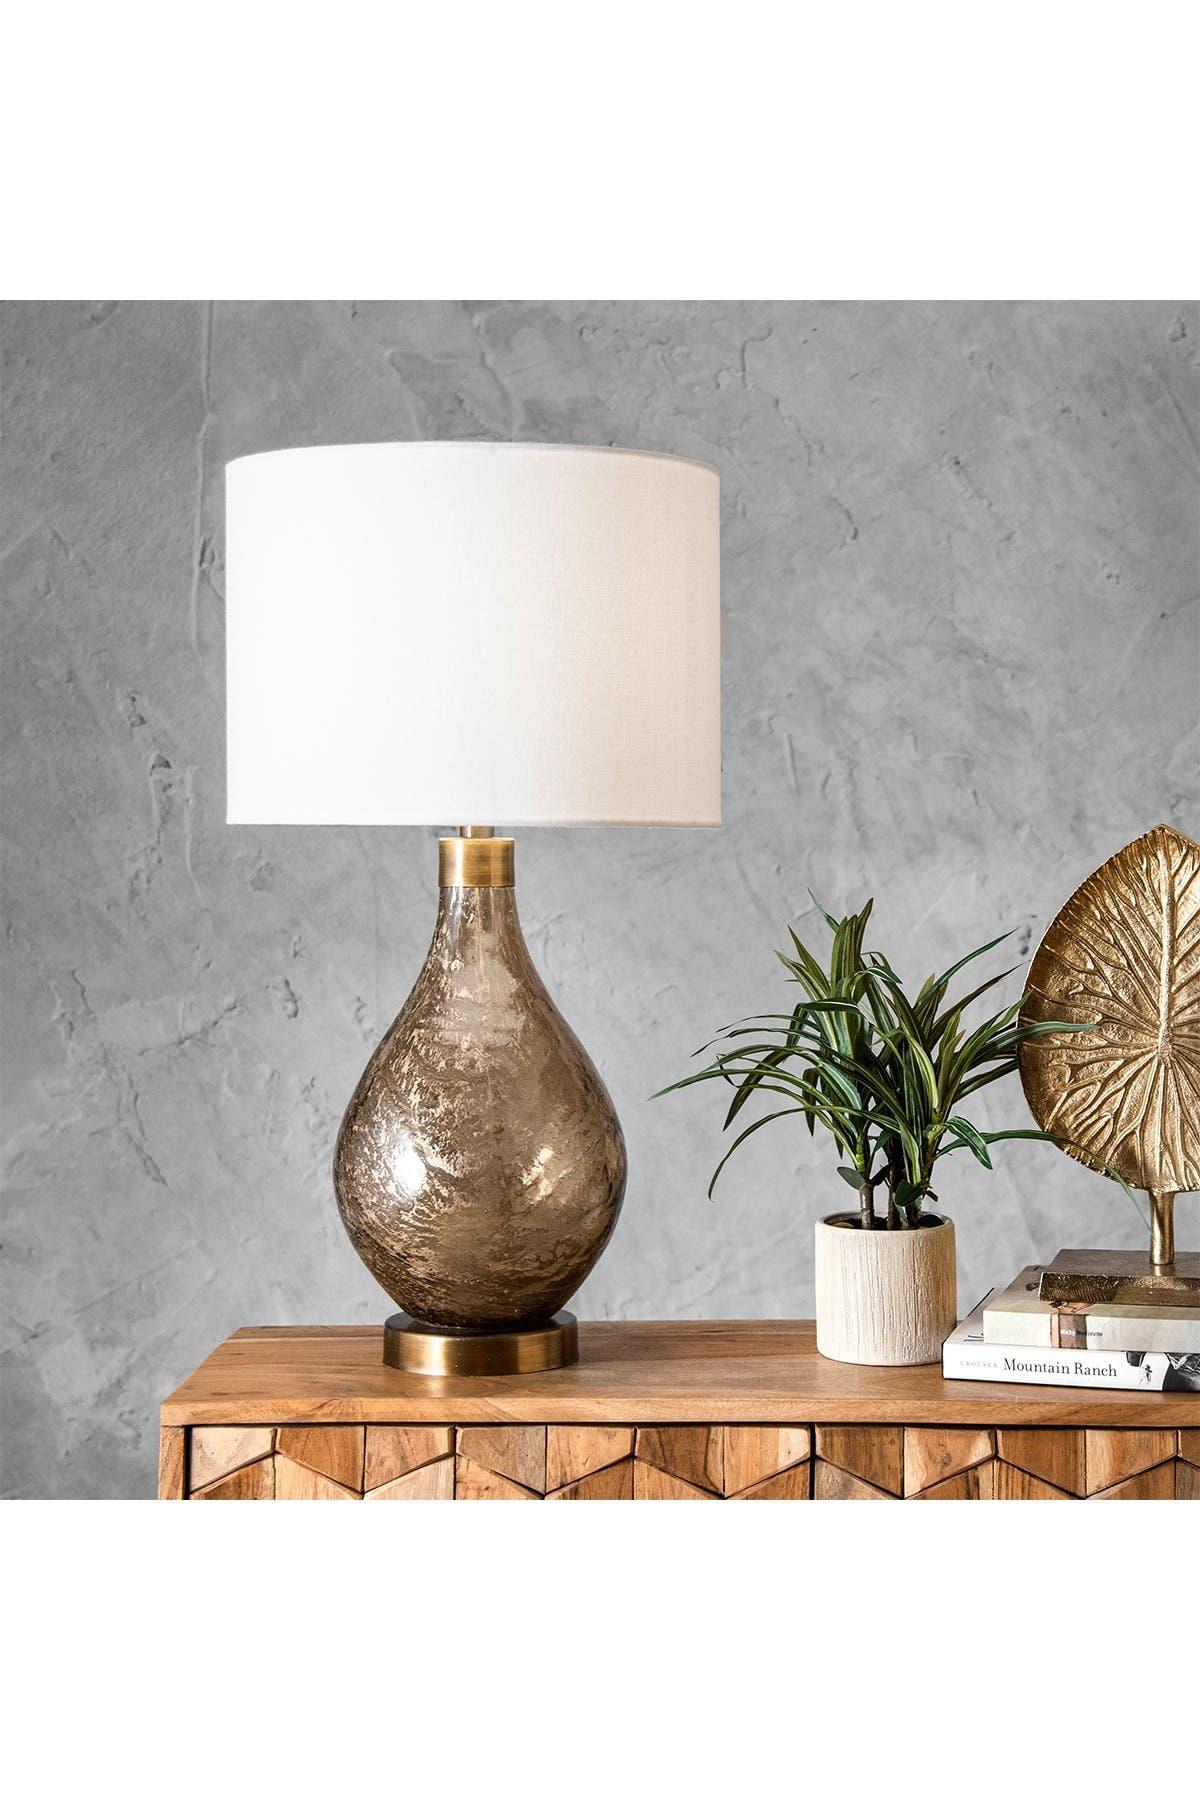 "Image of nuLOOM Beige Astor 25"" Glass Table Lamp"